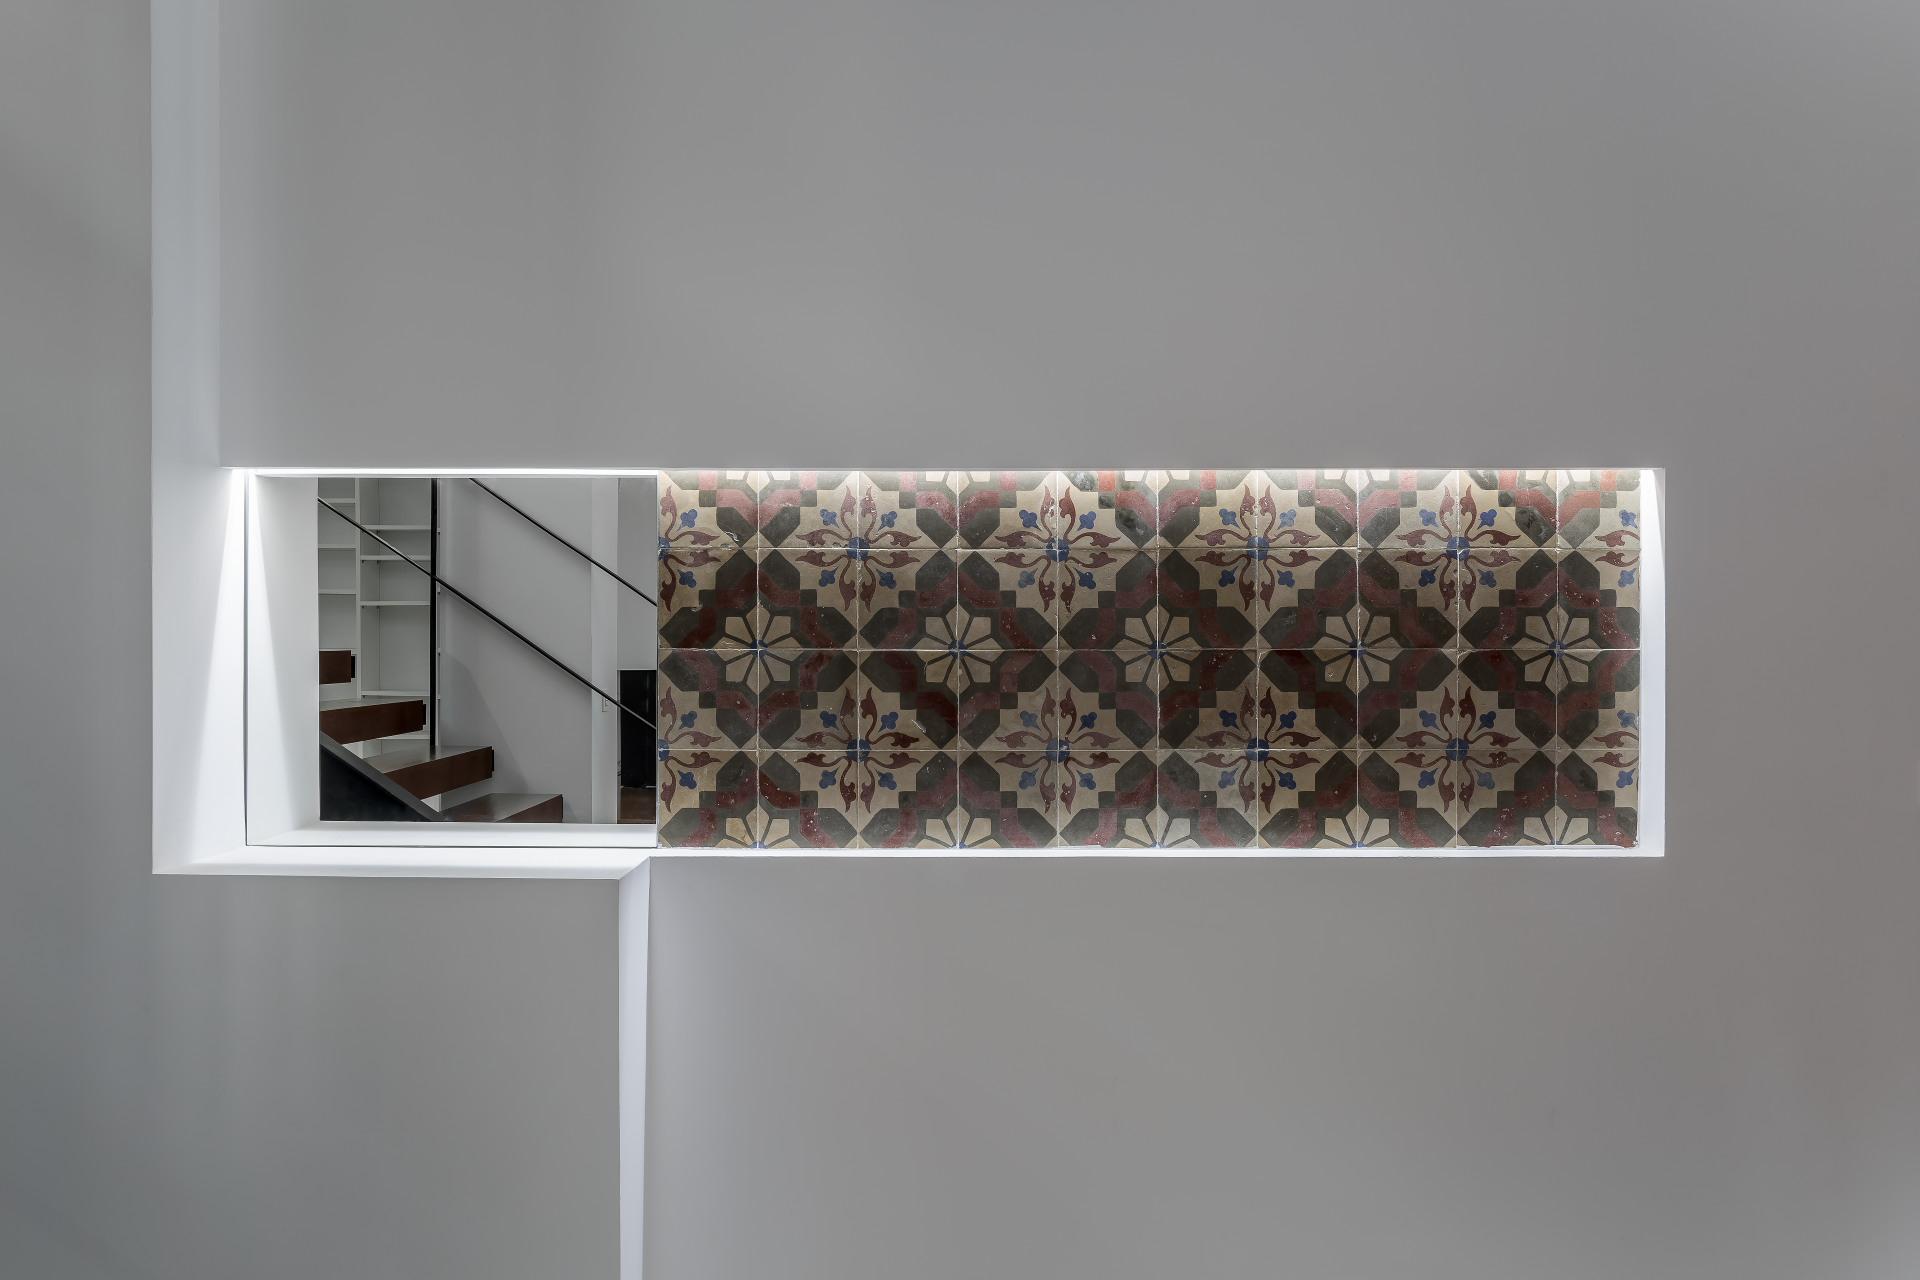 fotografia-arquitectura-valencia-german-cabo-viraje-rehabilitacion-campanar (7)